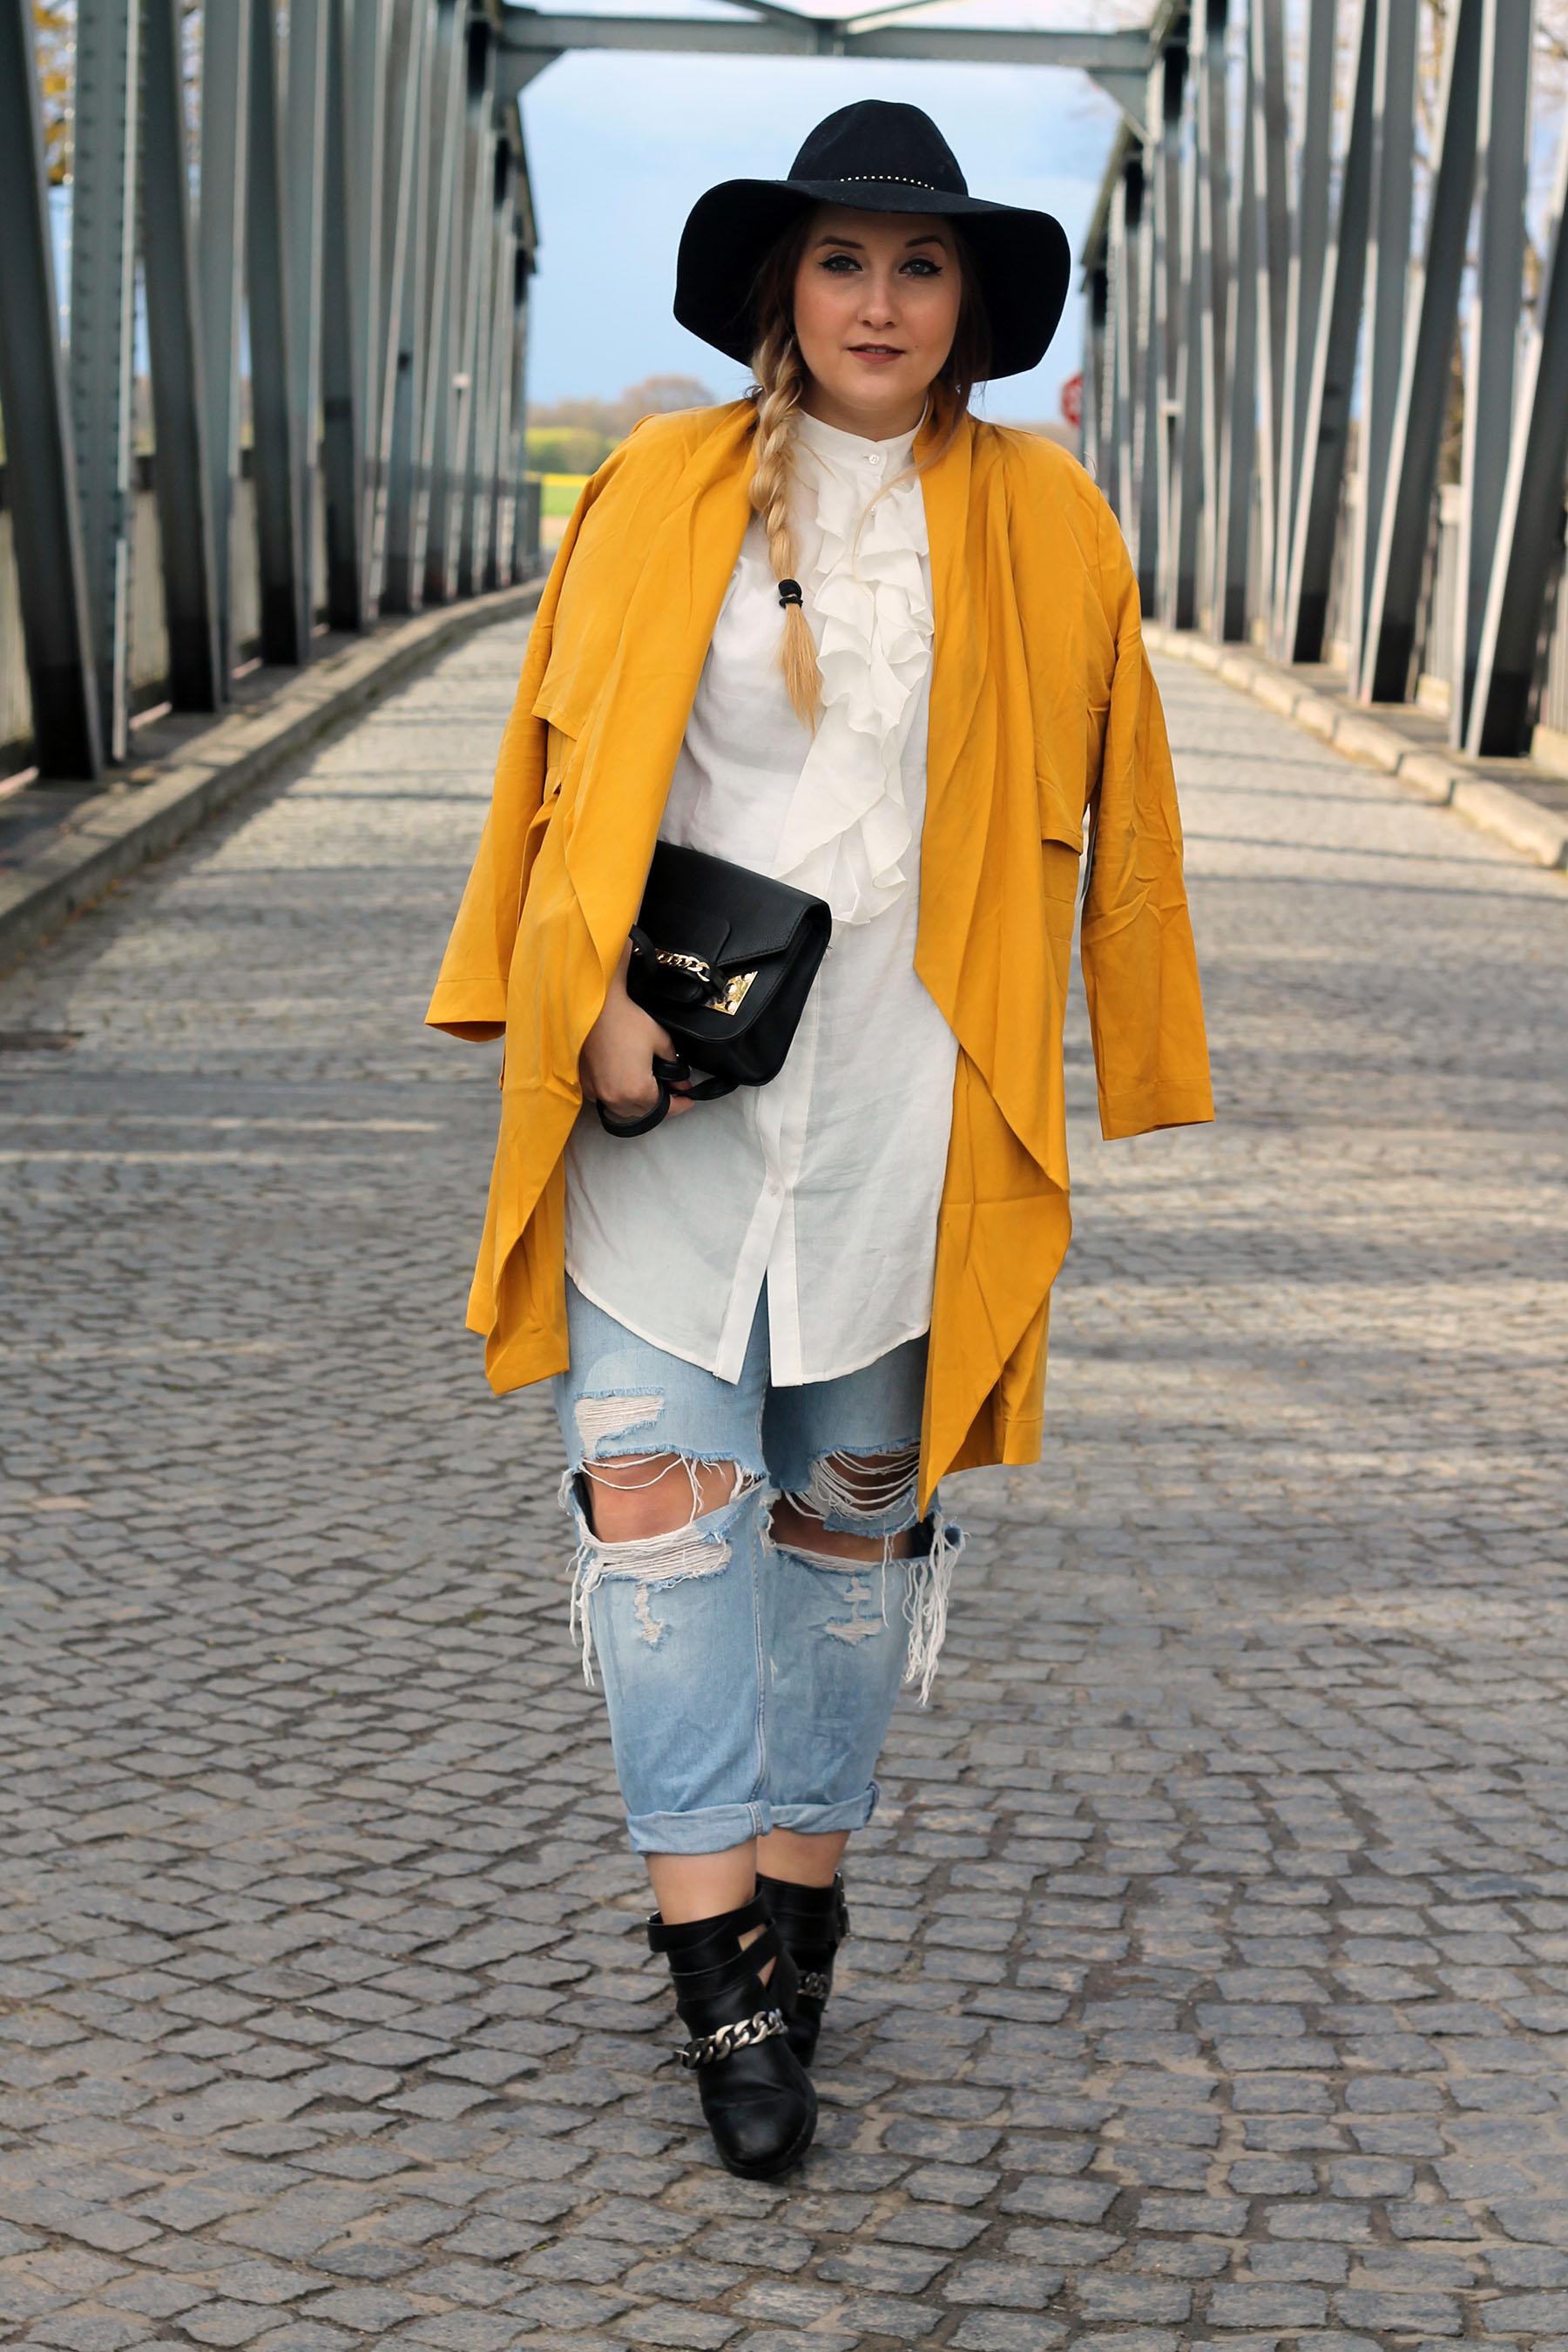 outfit-modeblog-fashionblog-primark-tasche-gelber-mantel